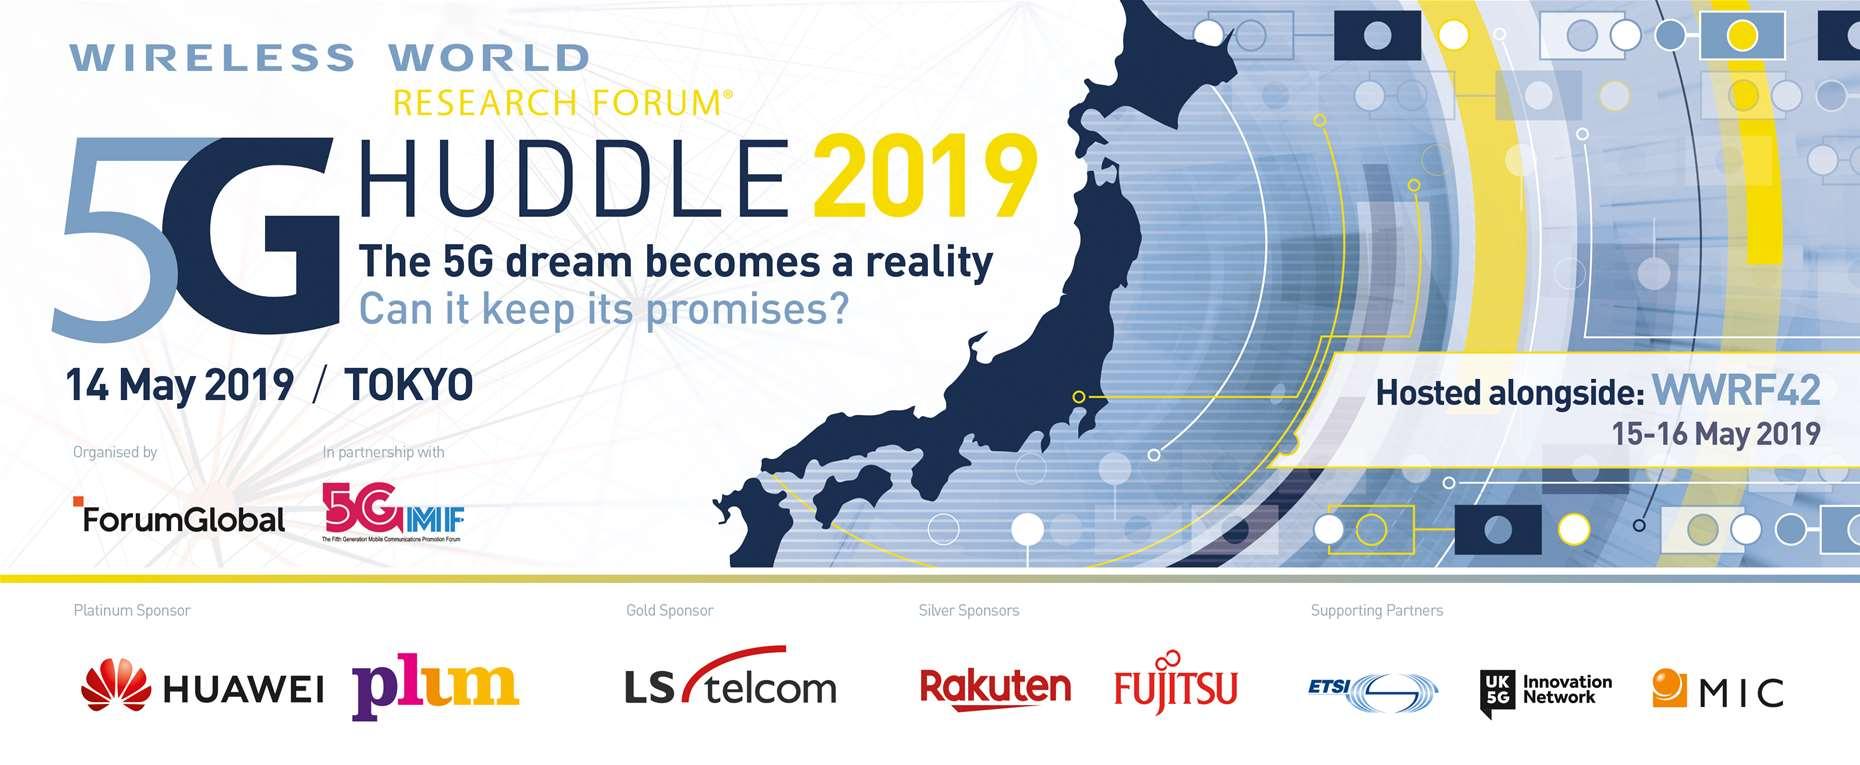 5G Huddle 2019 / WWRF42, Japan | Cookies Policy